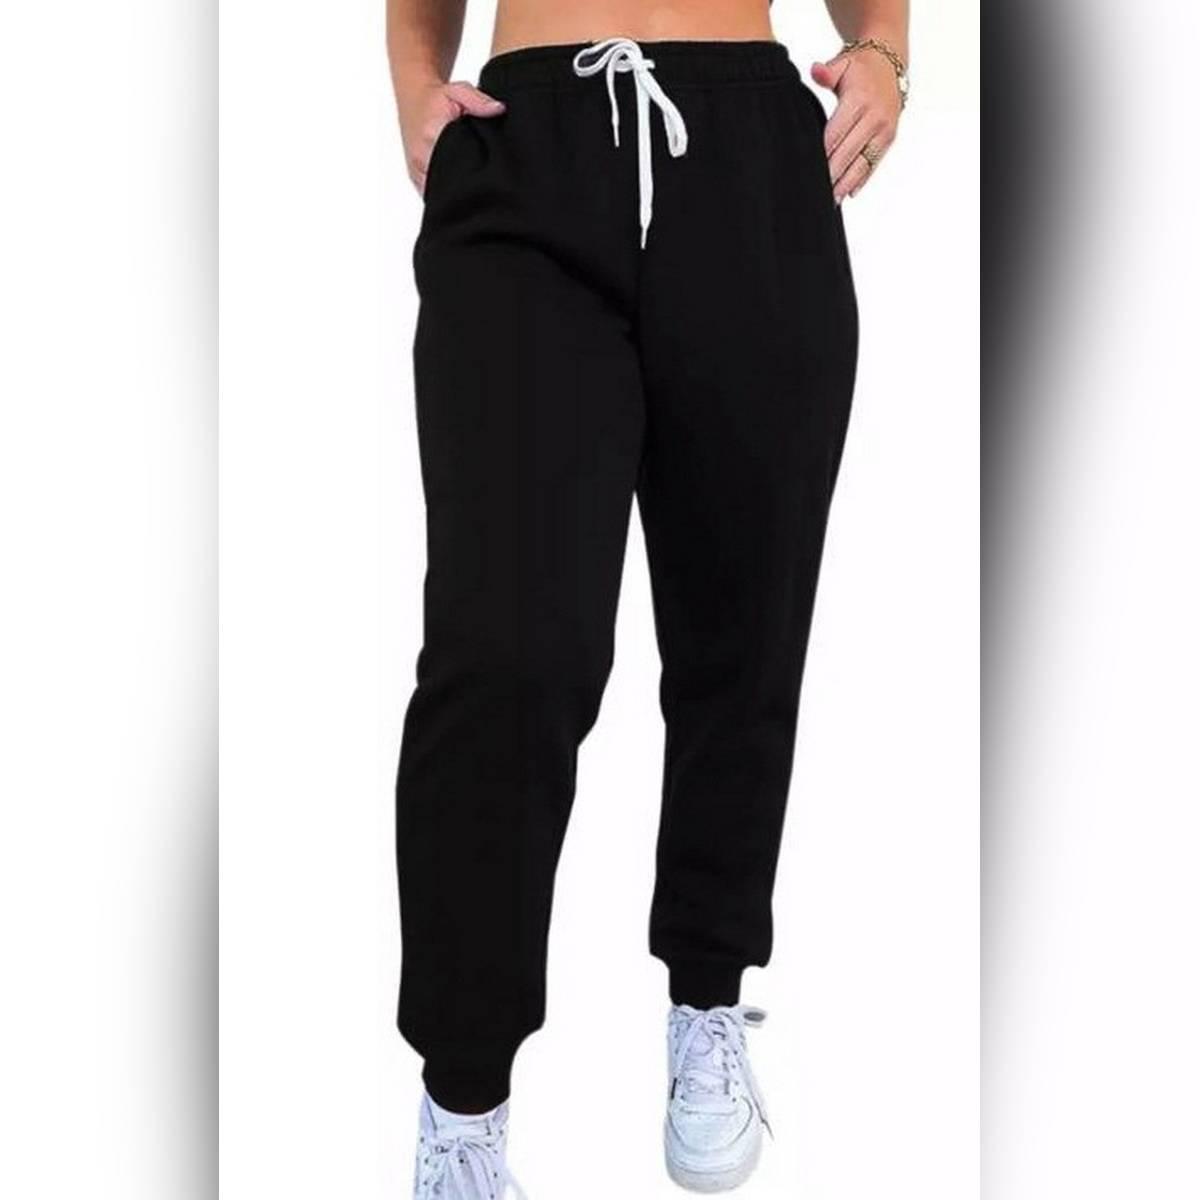 Women High Waist Pant Solid Beige Loose Joggers Female Trousers 2021  Autumn Winter Chic Track Pants Capris Sweatpants